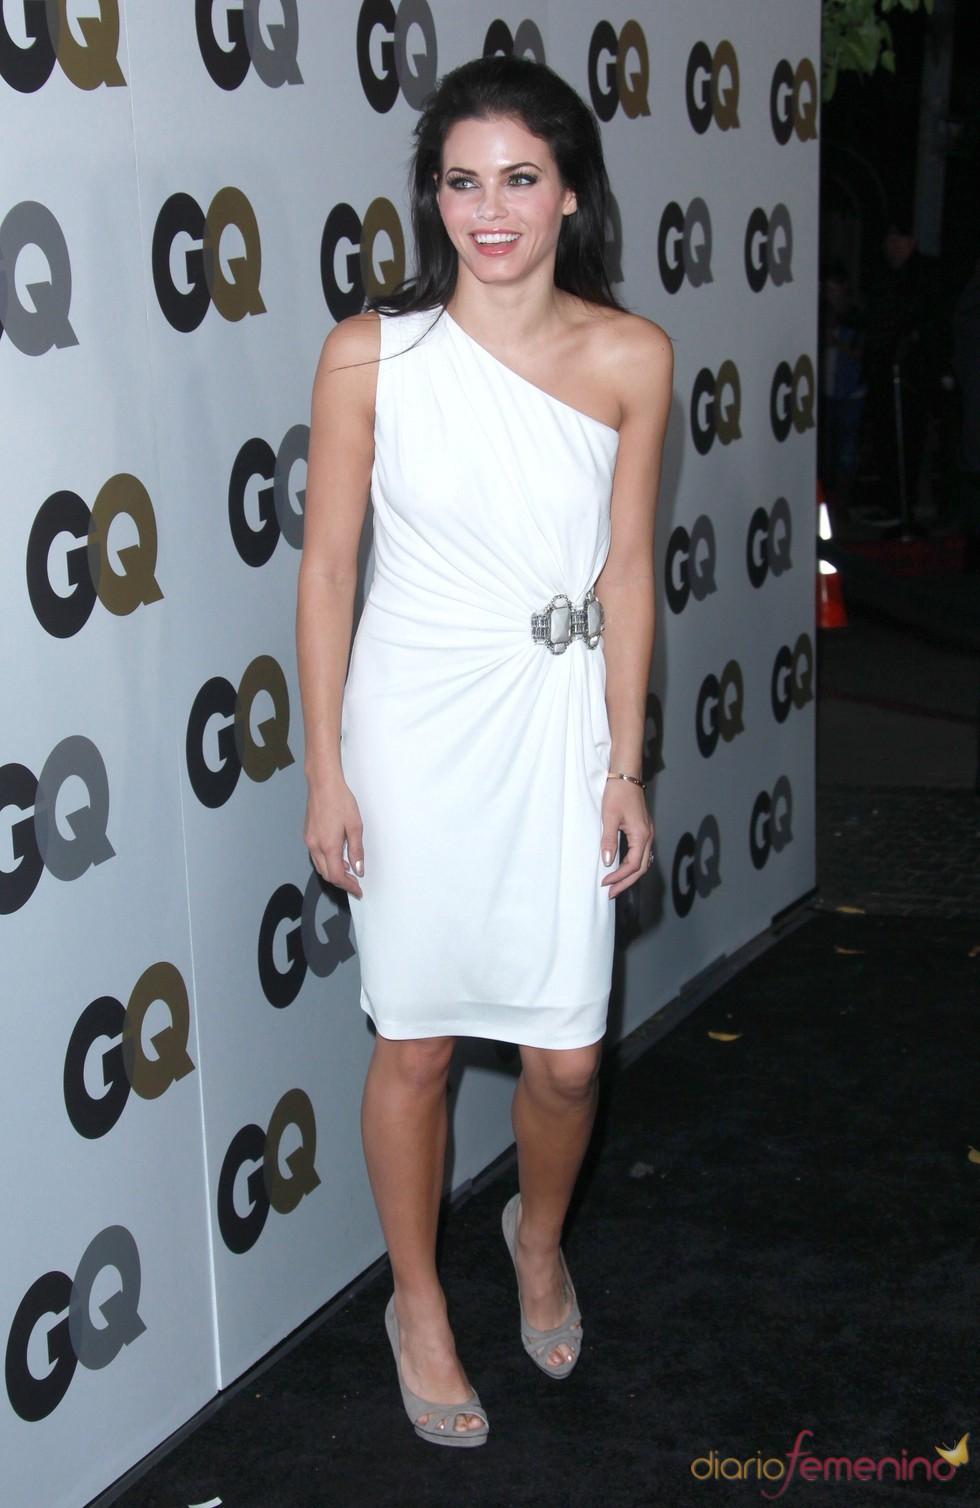 Fiesta GQ 2010 con Jenna Dewan